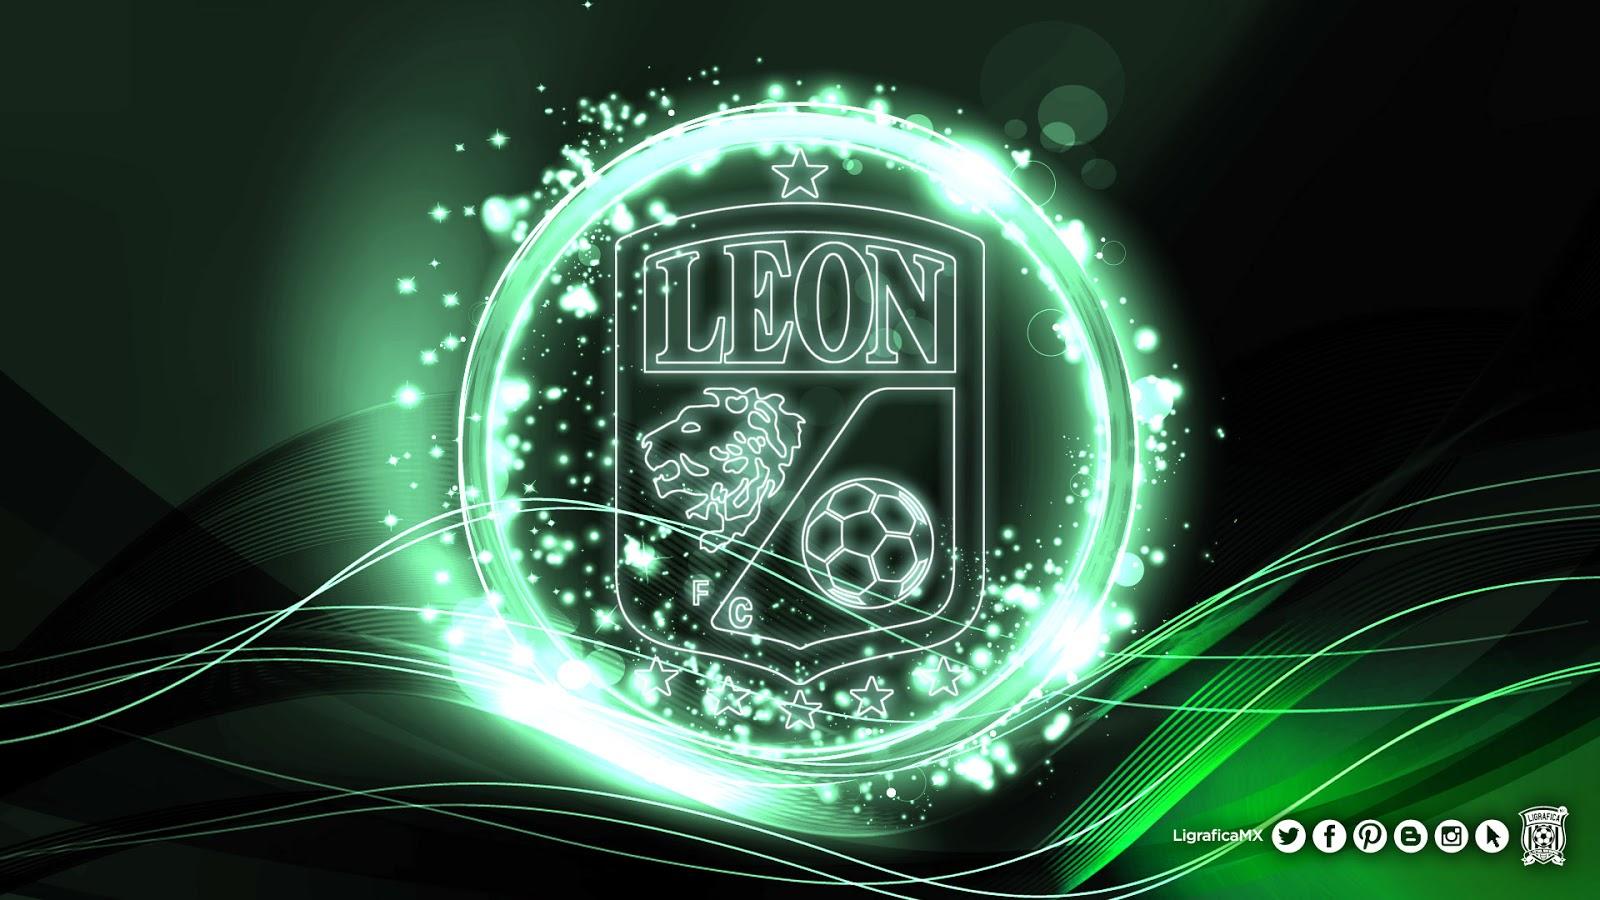 Club Leon Fc Wallpaper Liga bancomer mx 240214ctg